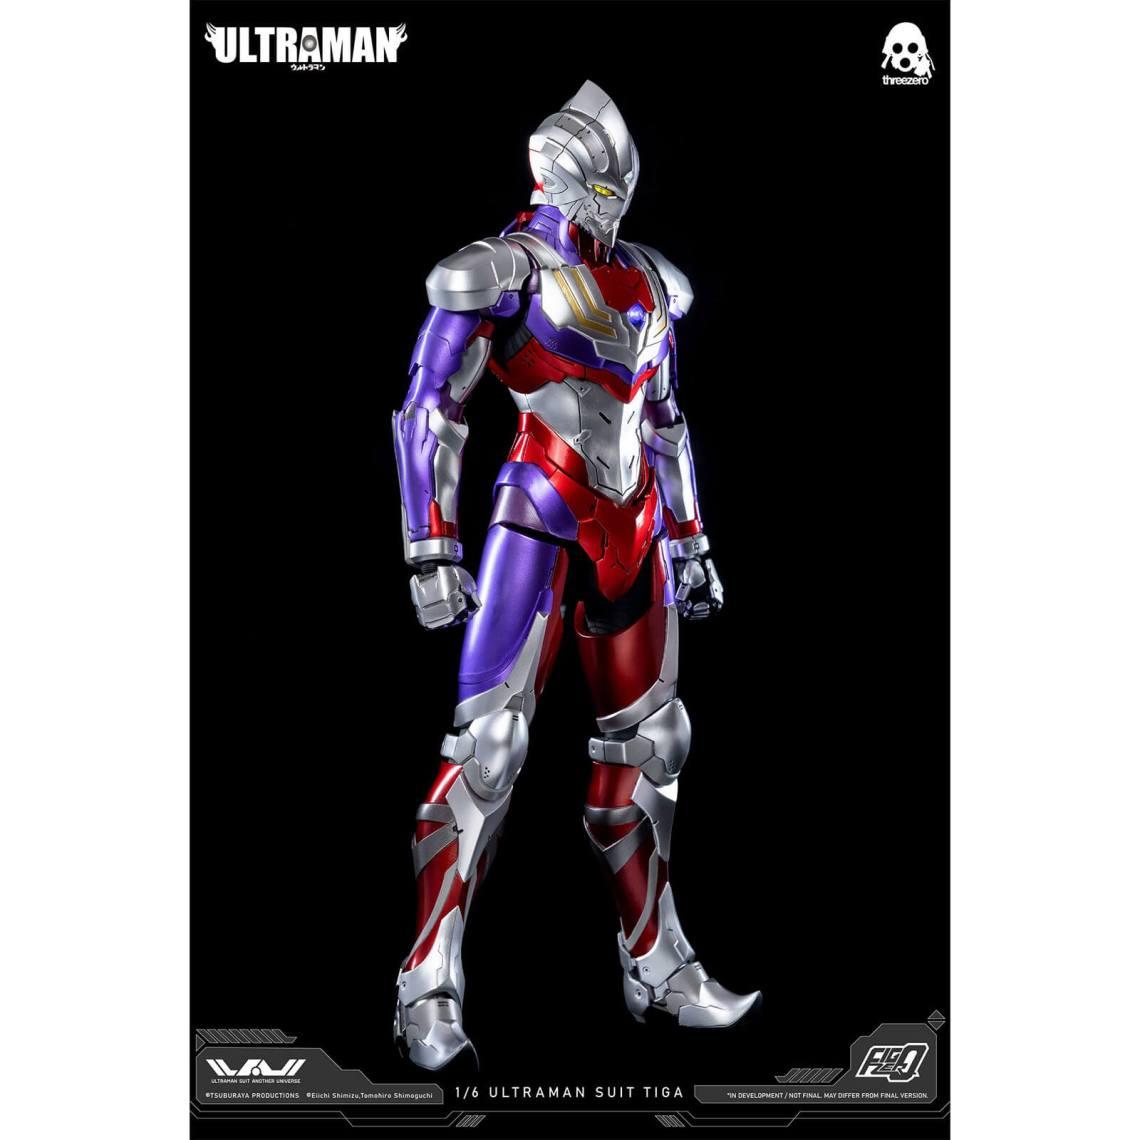 ThreeZero Ultraman FigZero 1/6 Scale Collectible Figure - Ultraman Suit Tiga